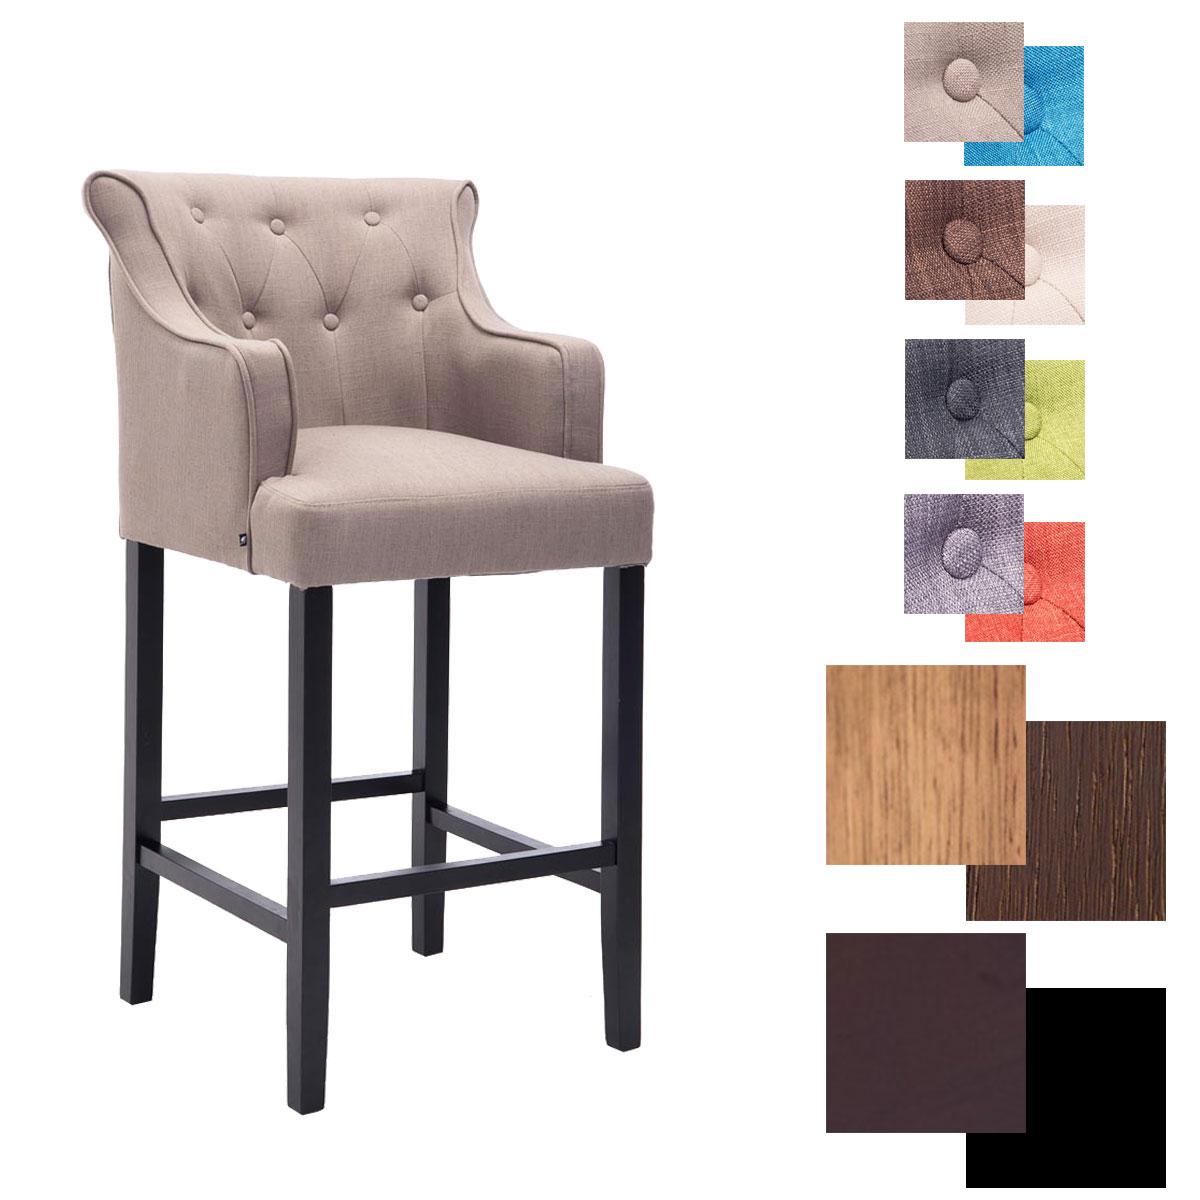 barhocker lykso mit lehne sessel tresen thekenhocker holz. Black Bedroom Furniture Sets. Home Design Ideas